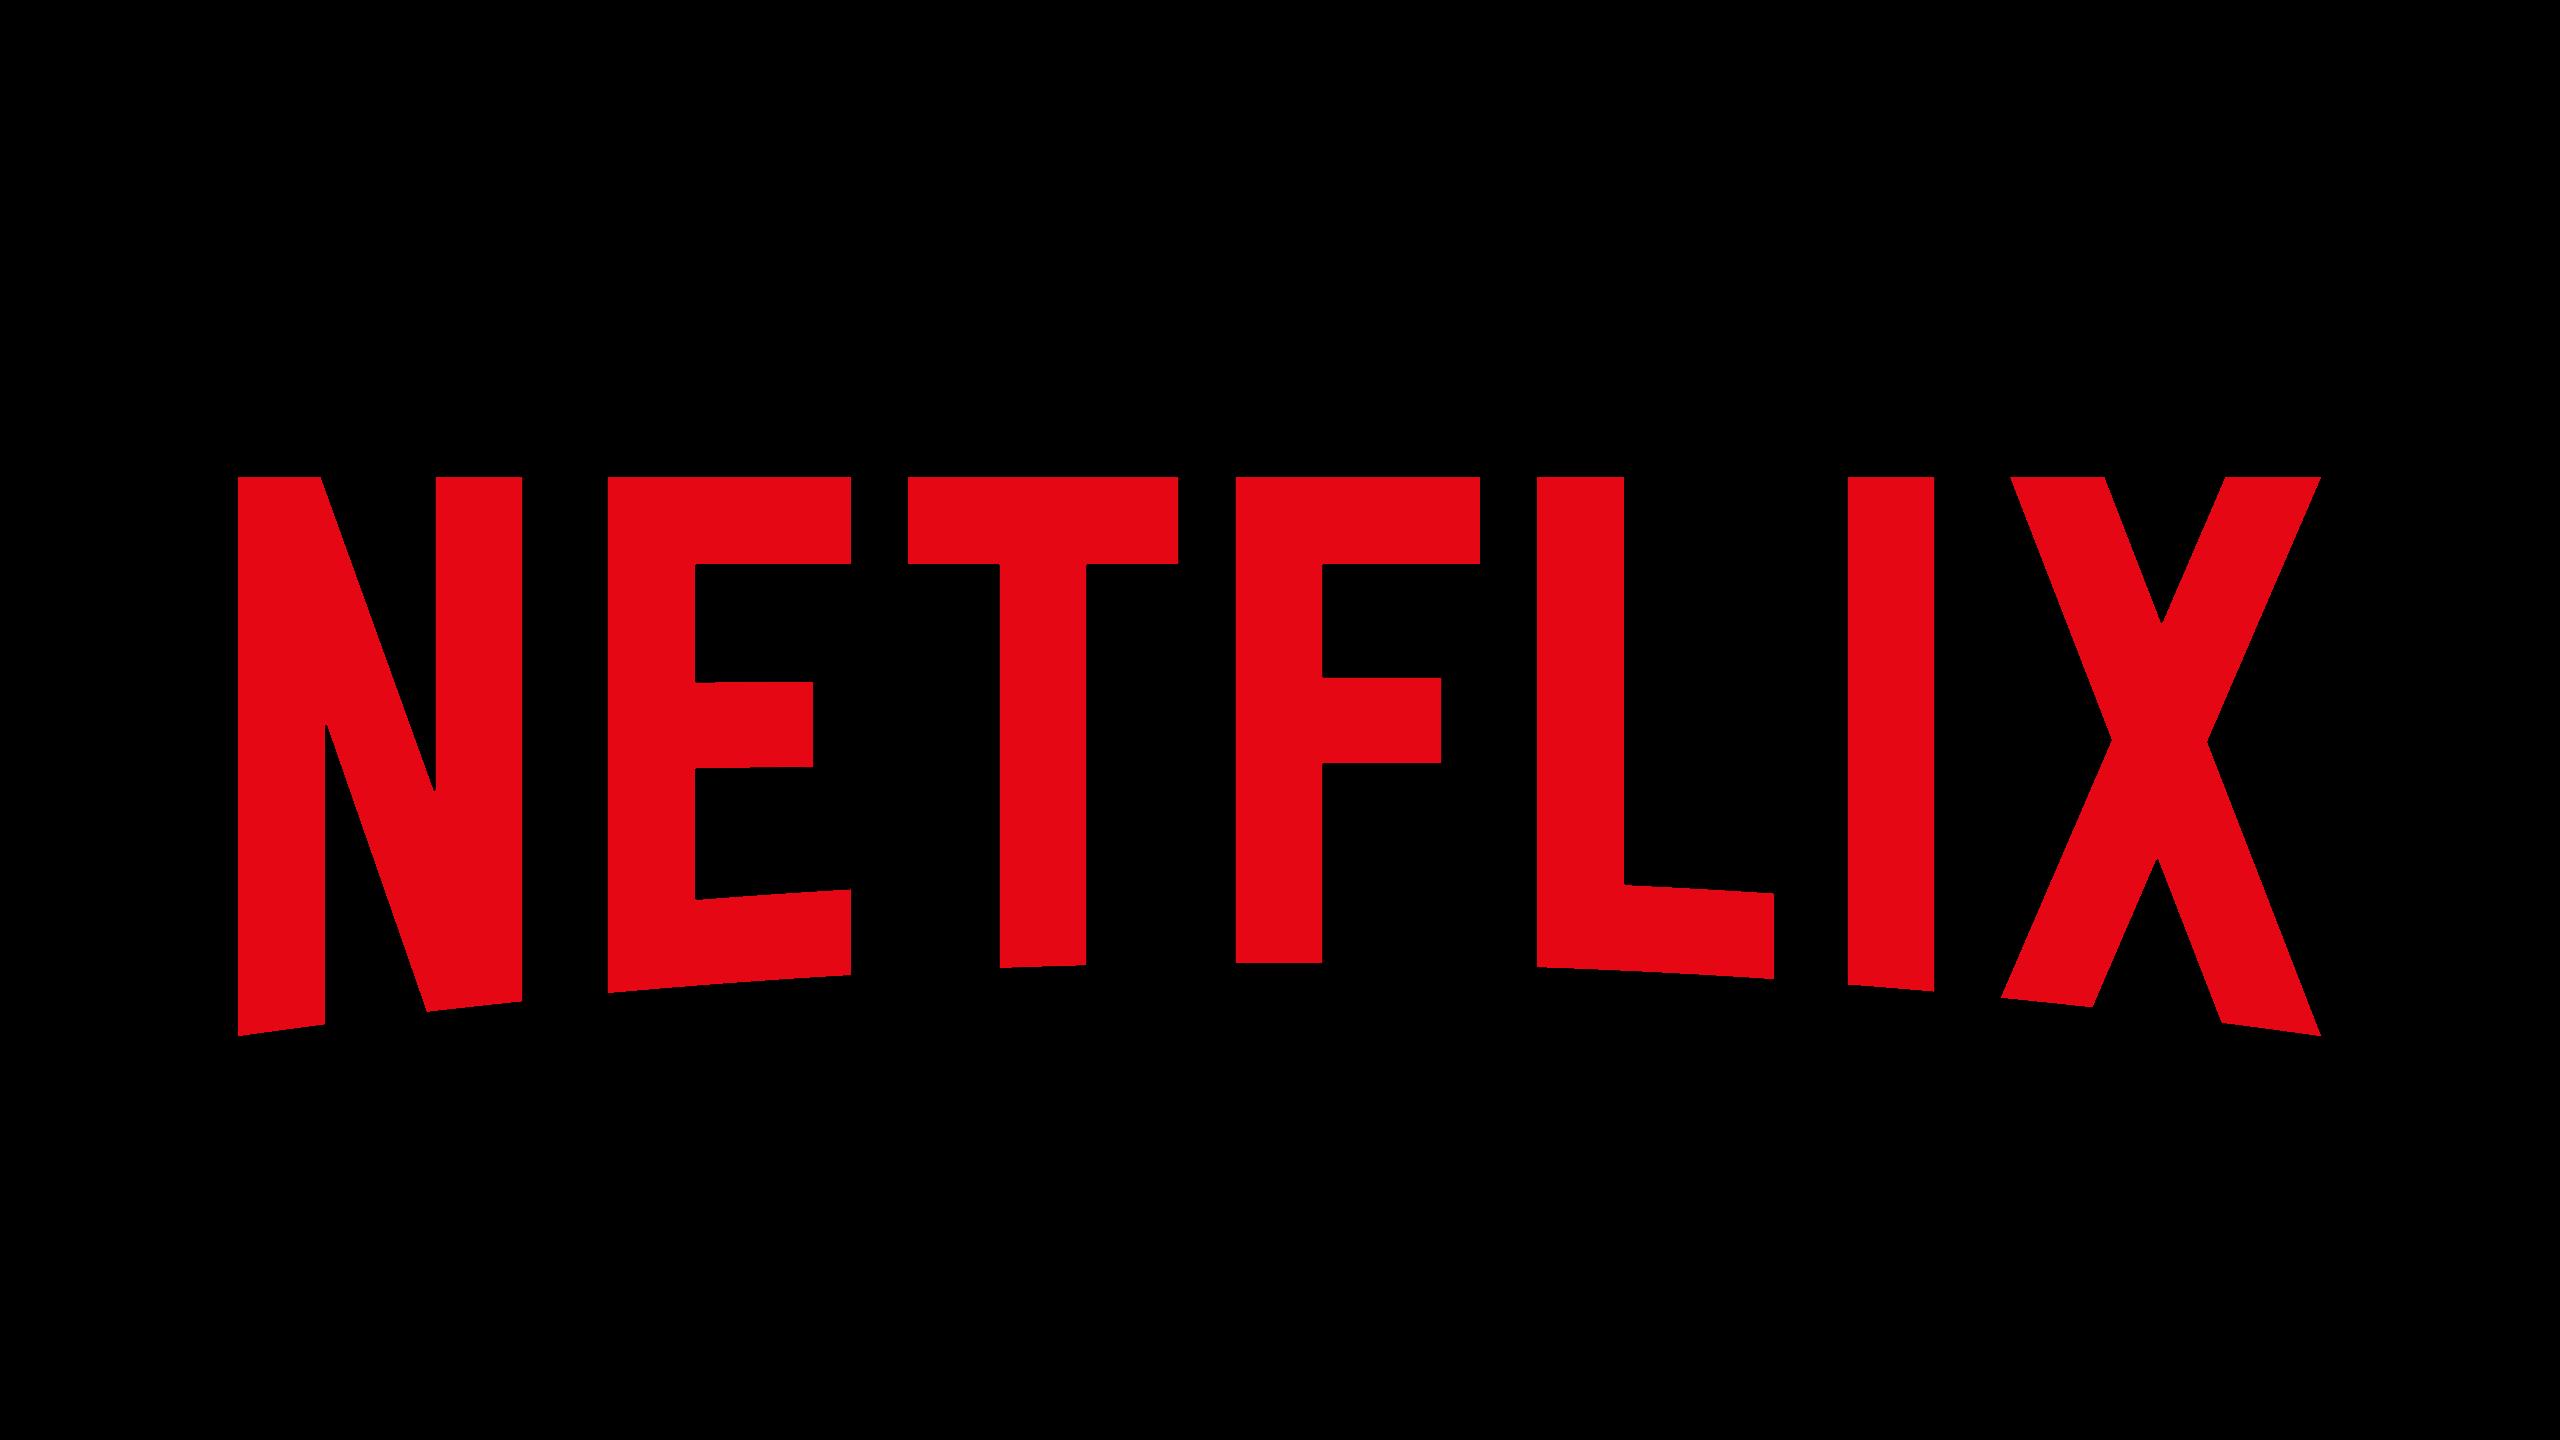 10 Best Netflix Original Series in 2021